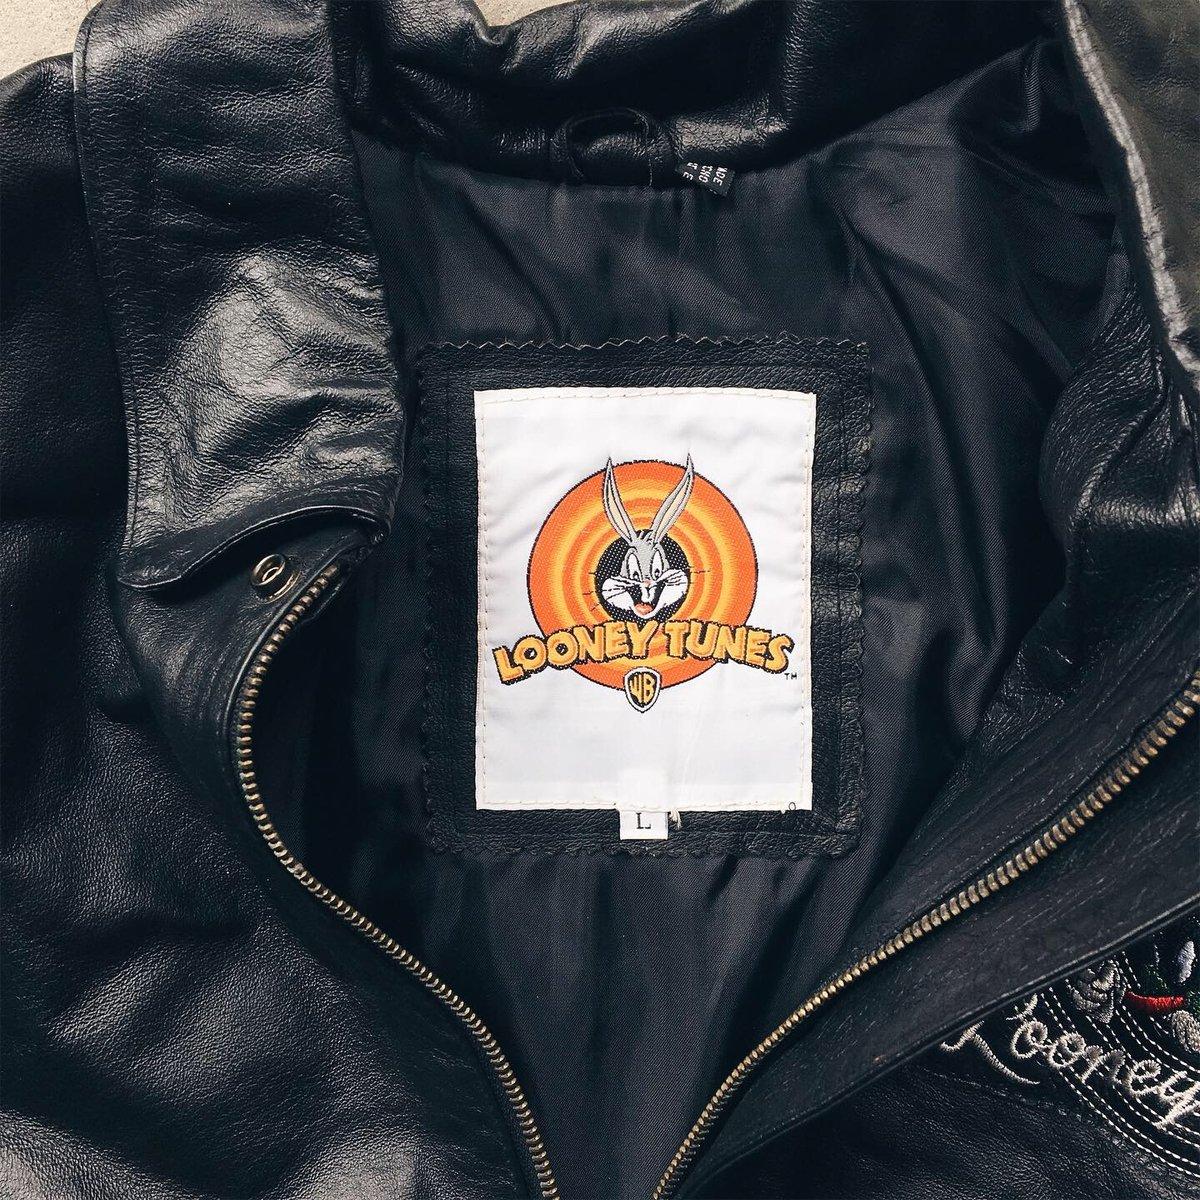 Image of Original 1996 Looney Tunes Jacket.